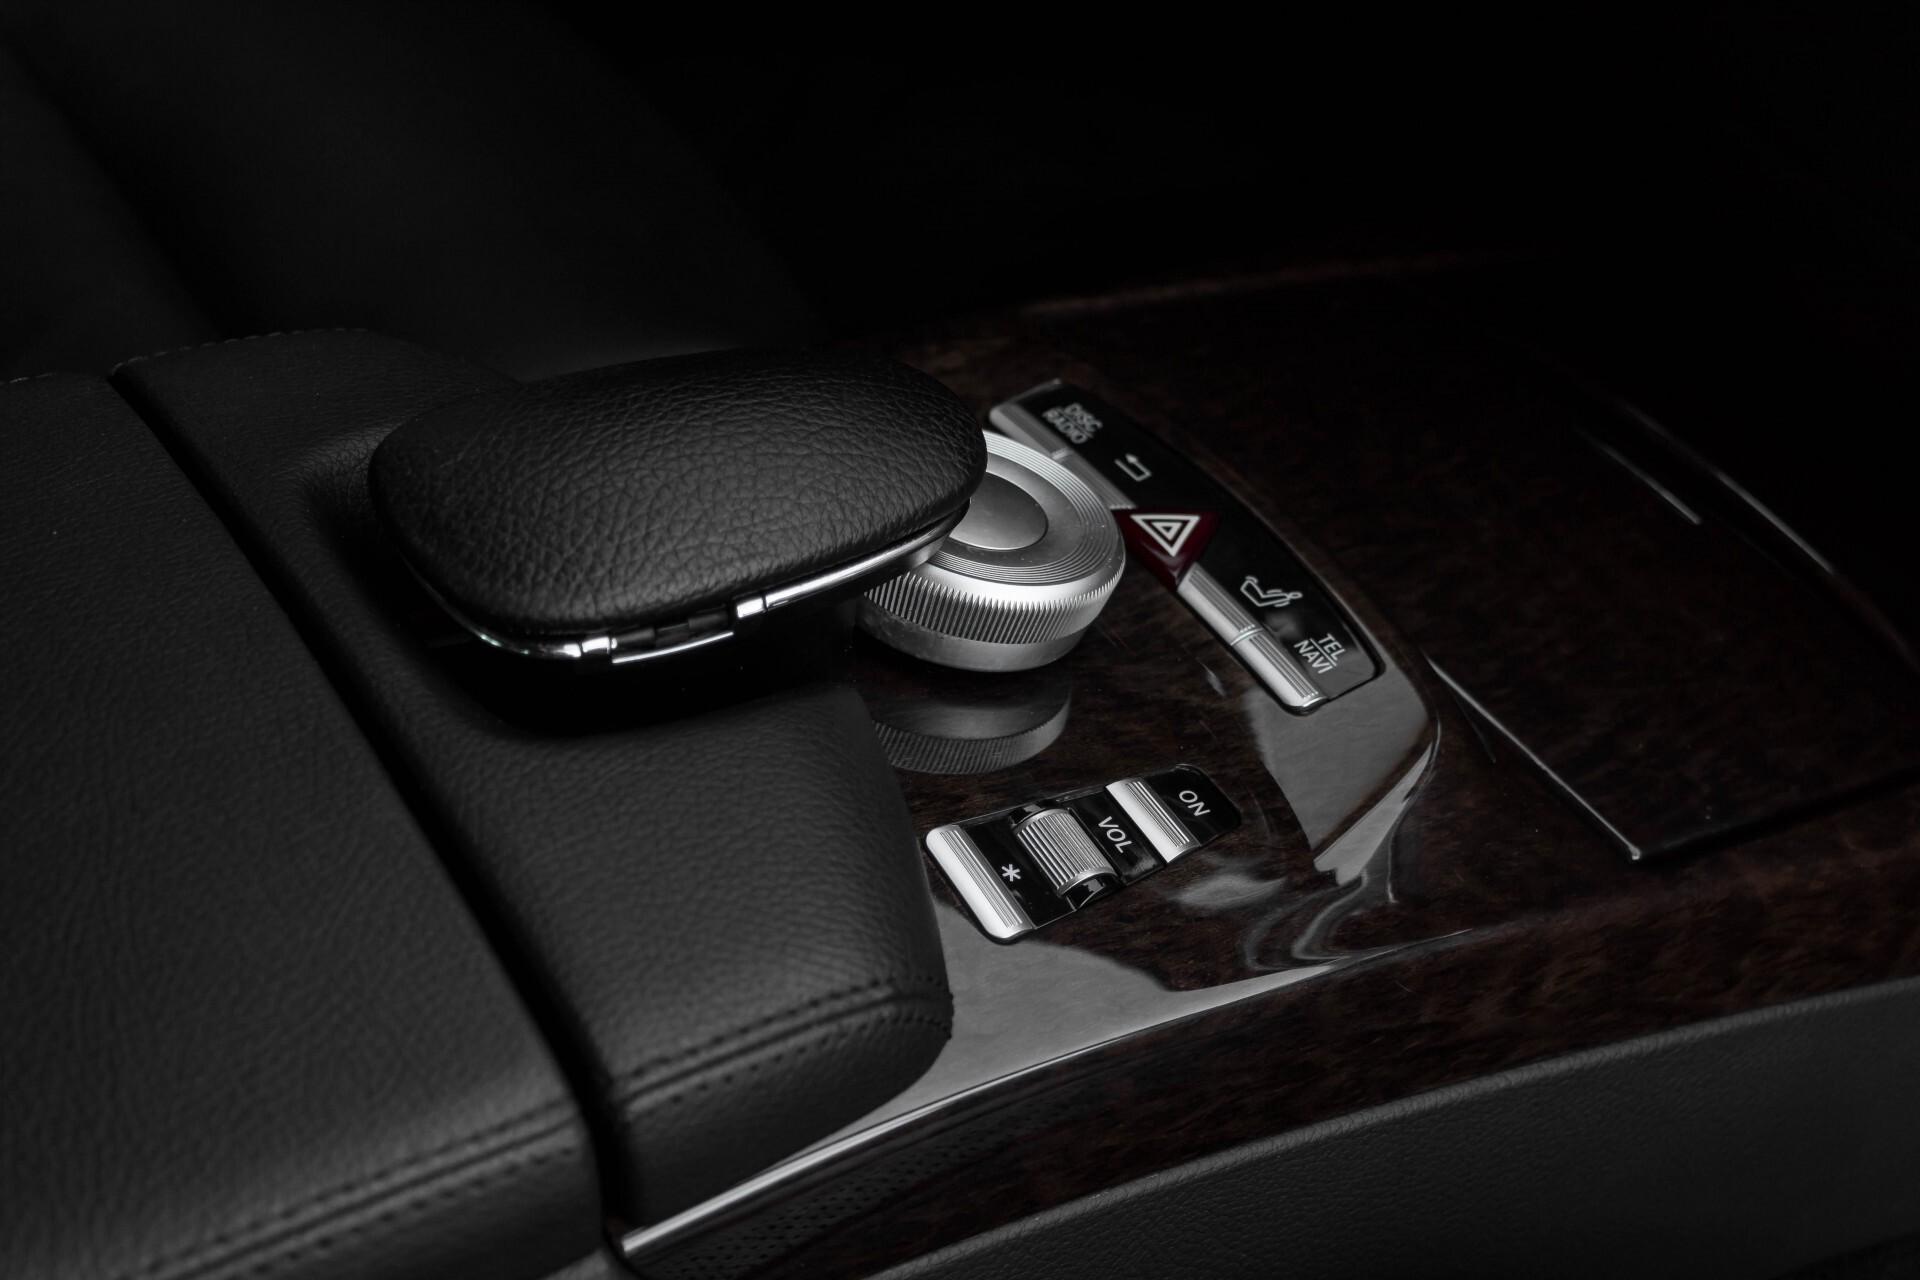 Mercedes-Benz S-Klasse 350 Bluetec Keyless/Distronic/Nightvision/Schuifdak/Harman-Kardon Aut7 Foto 48